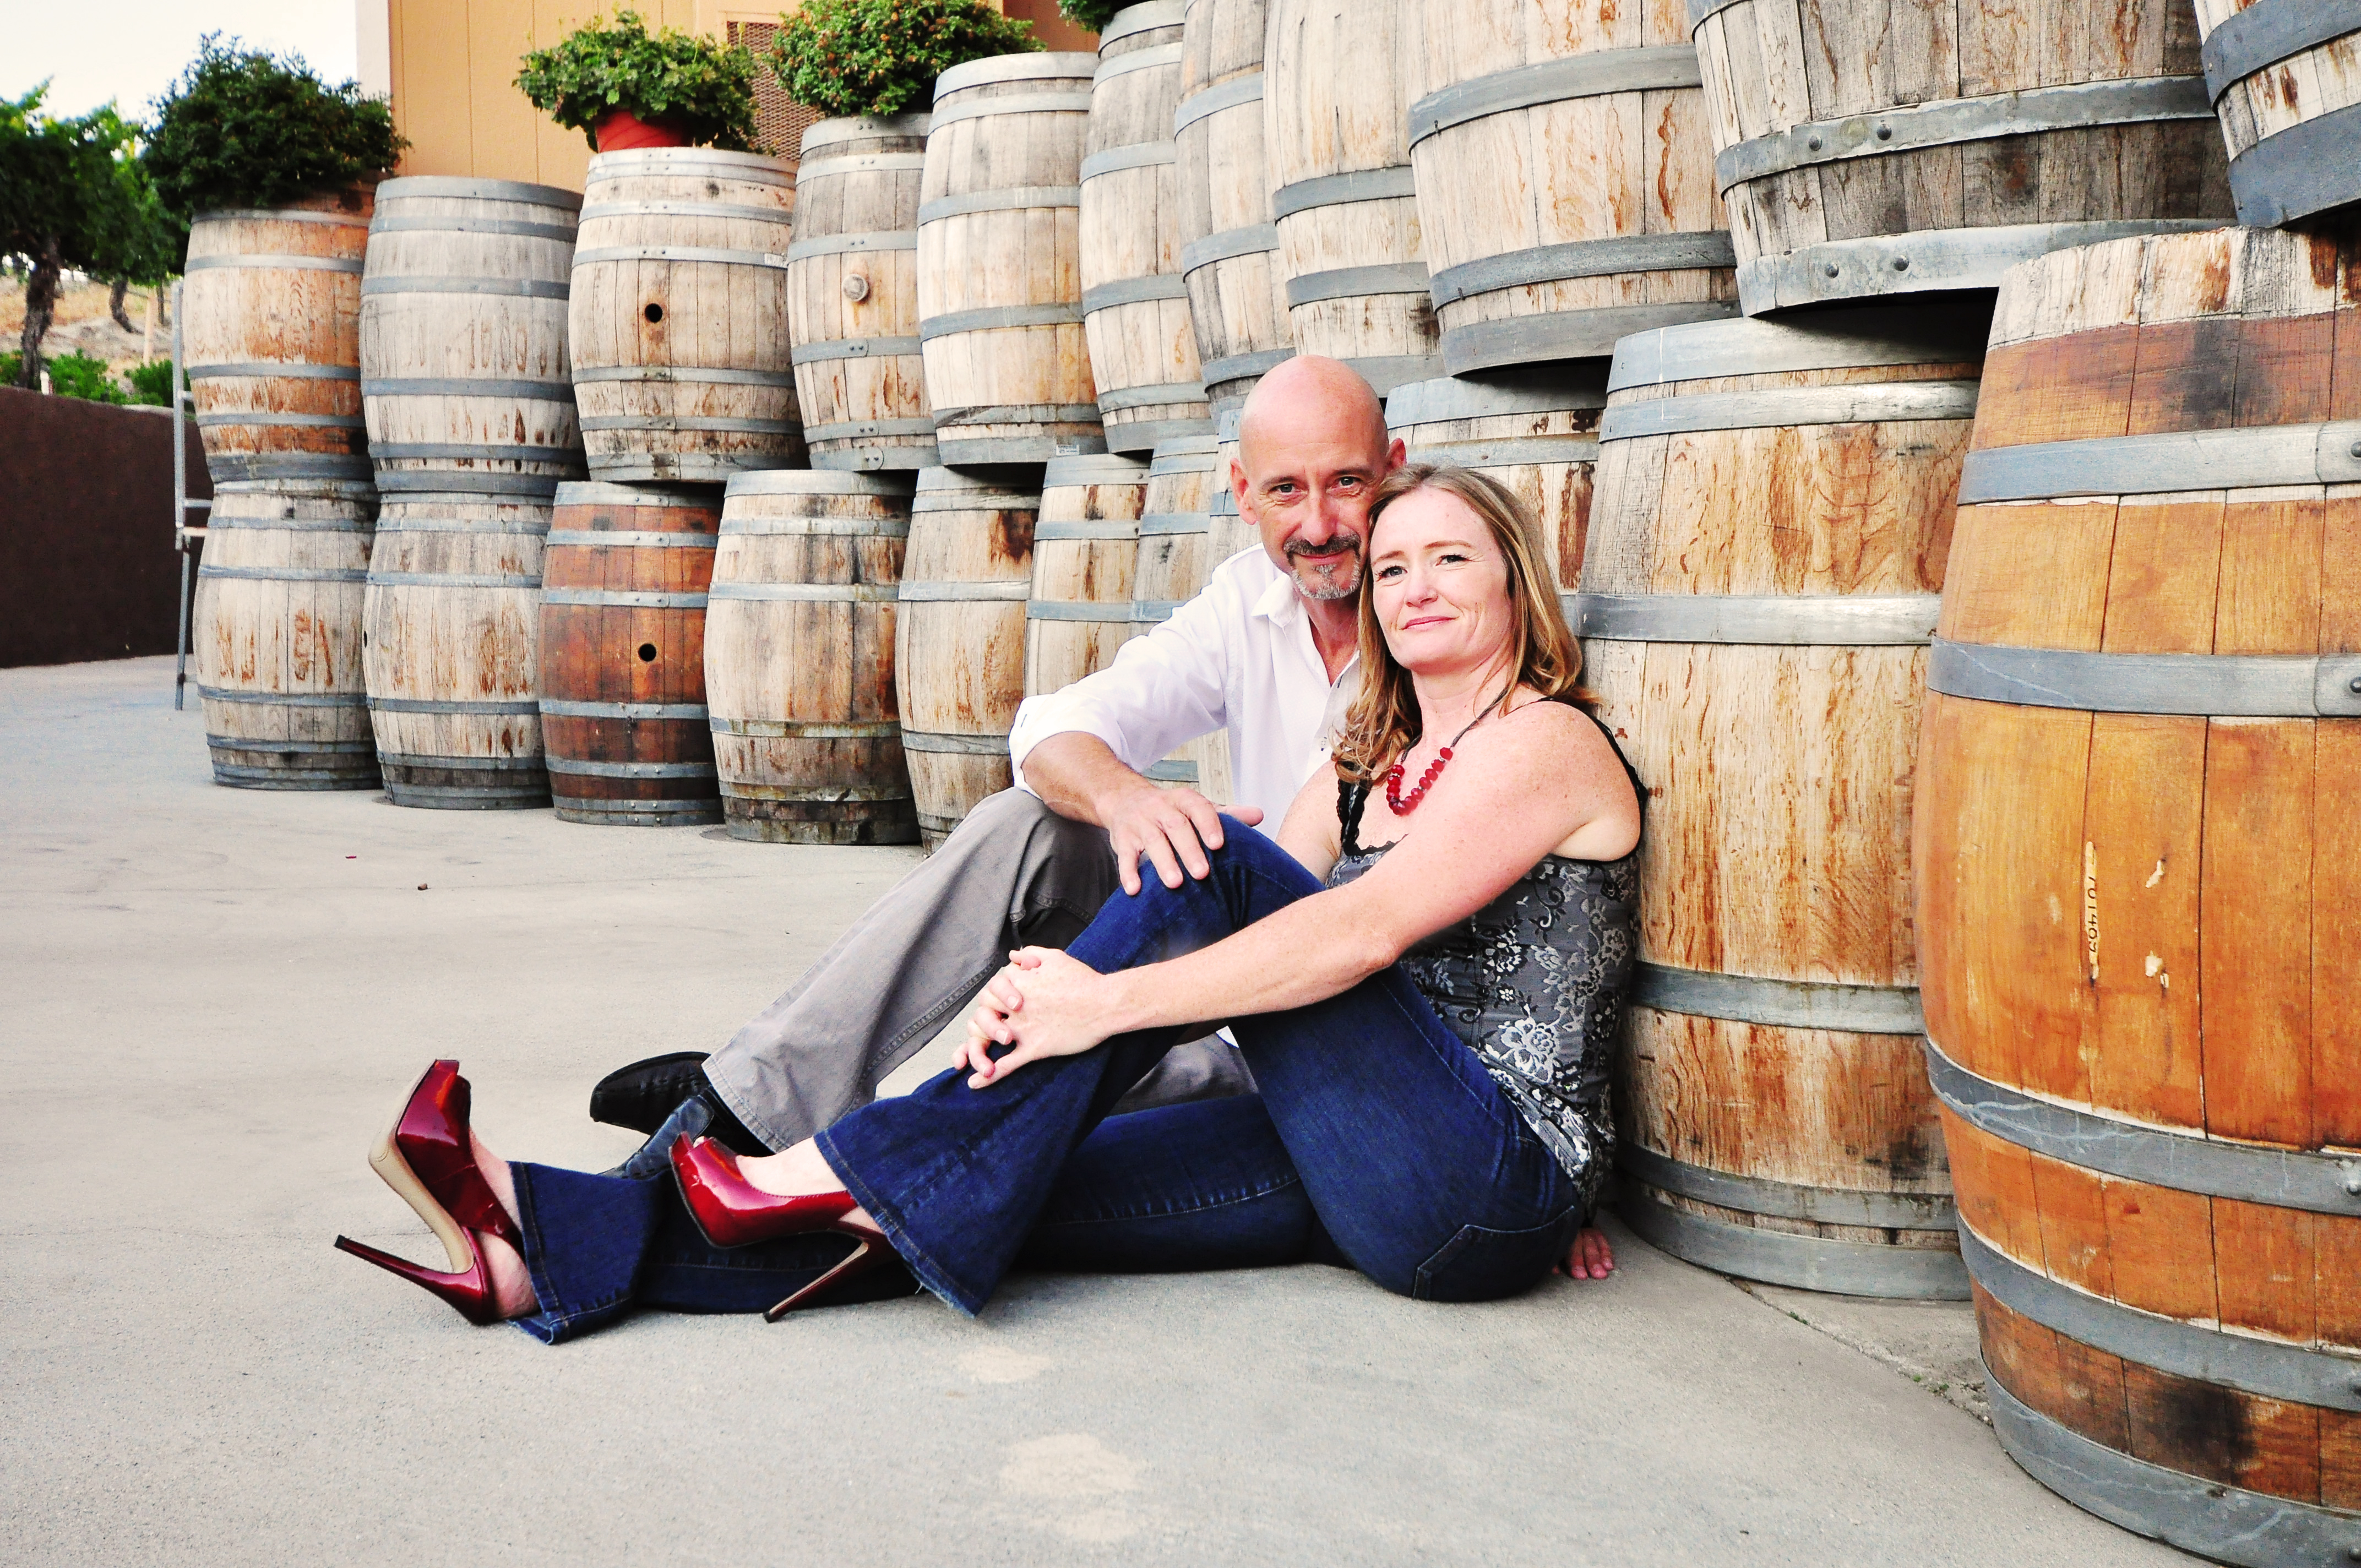 la joll engagement, san diego engagement, couple's portraits. la joll asunset, engagement portraits, winery engagement